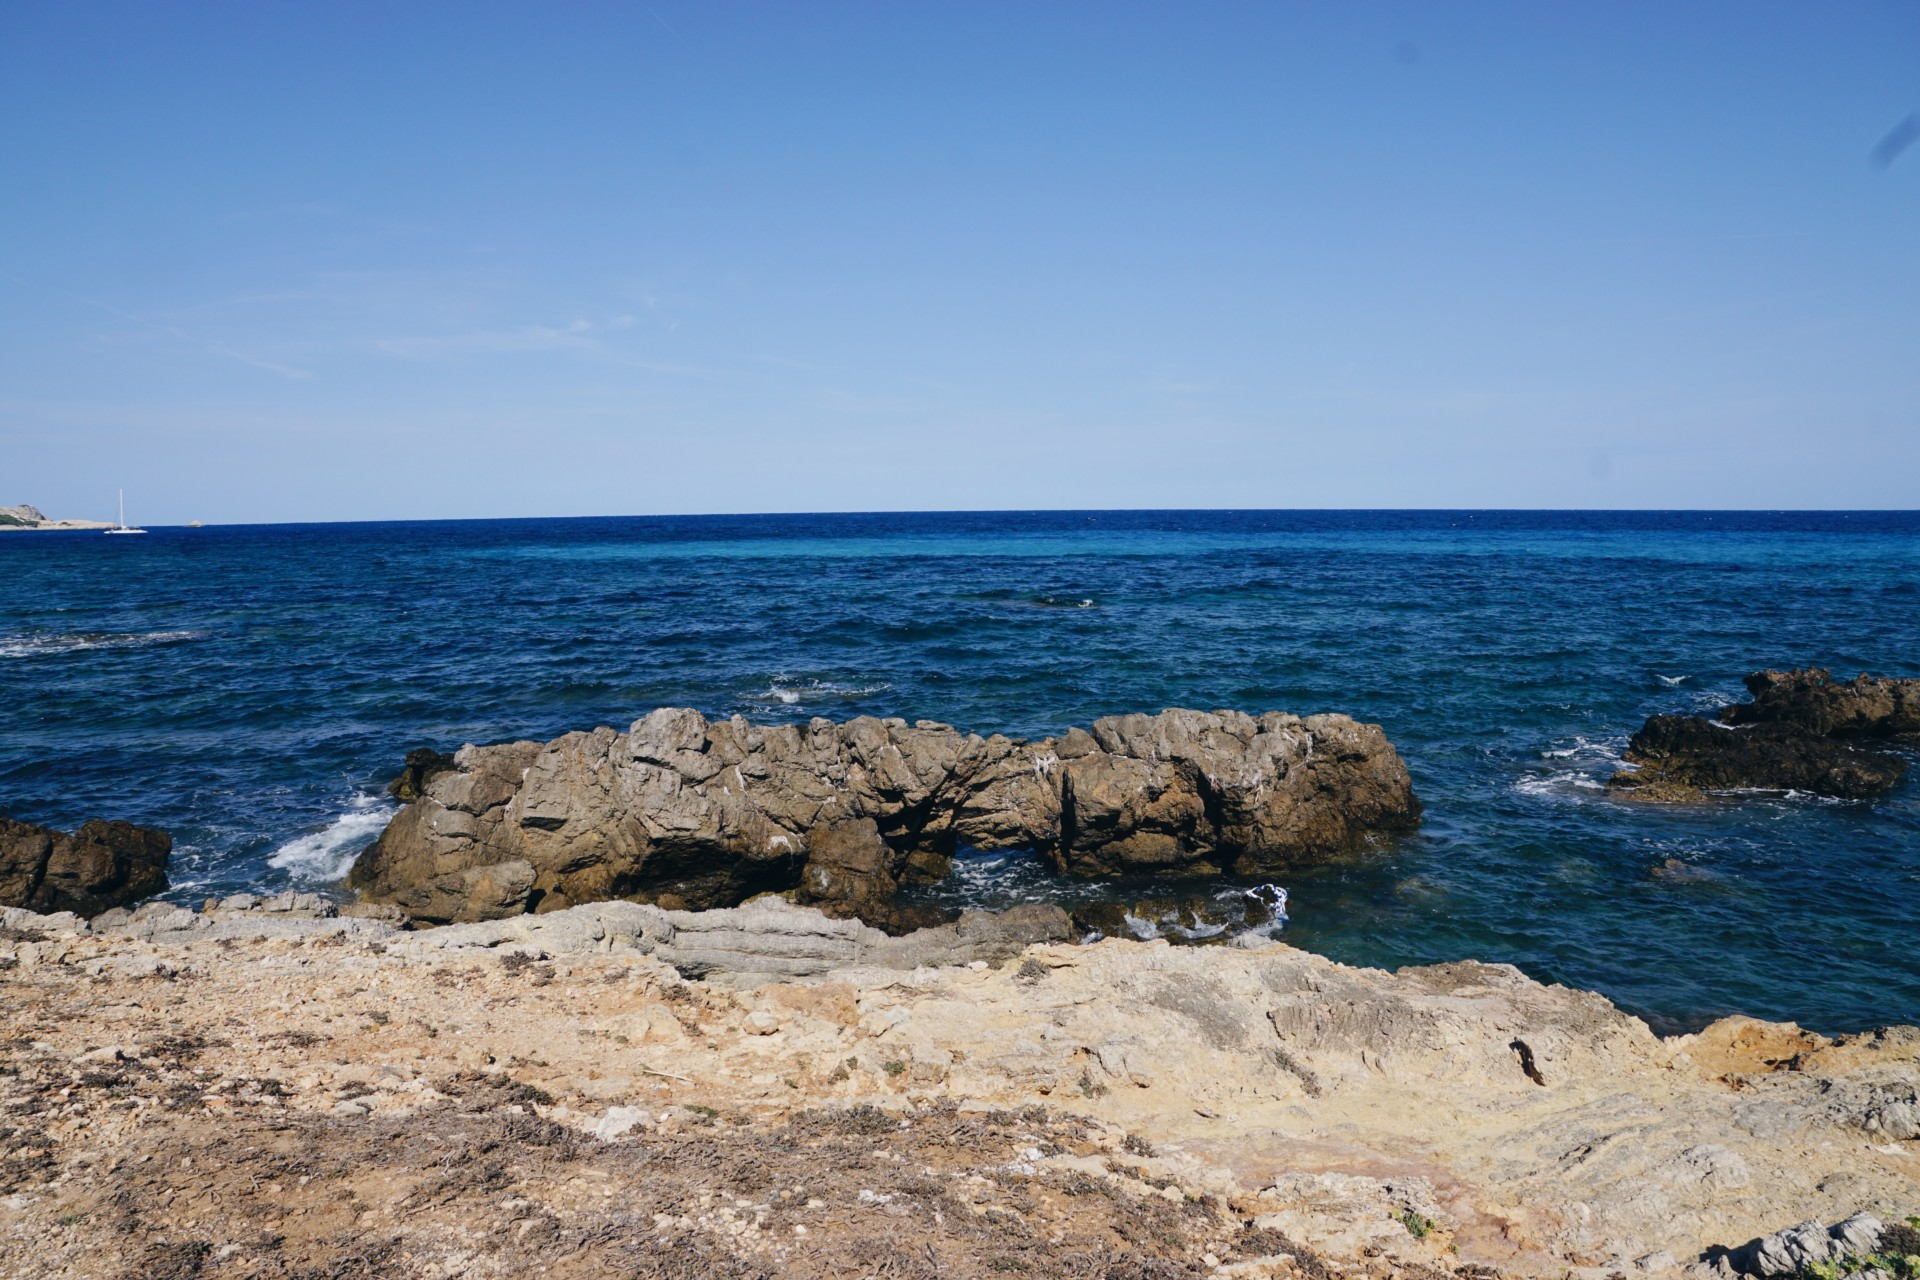 mallorca_palma_spain_travel_spanien_испания_майорка_треве